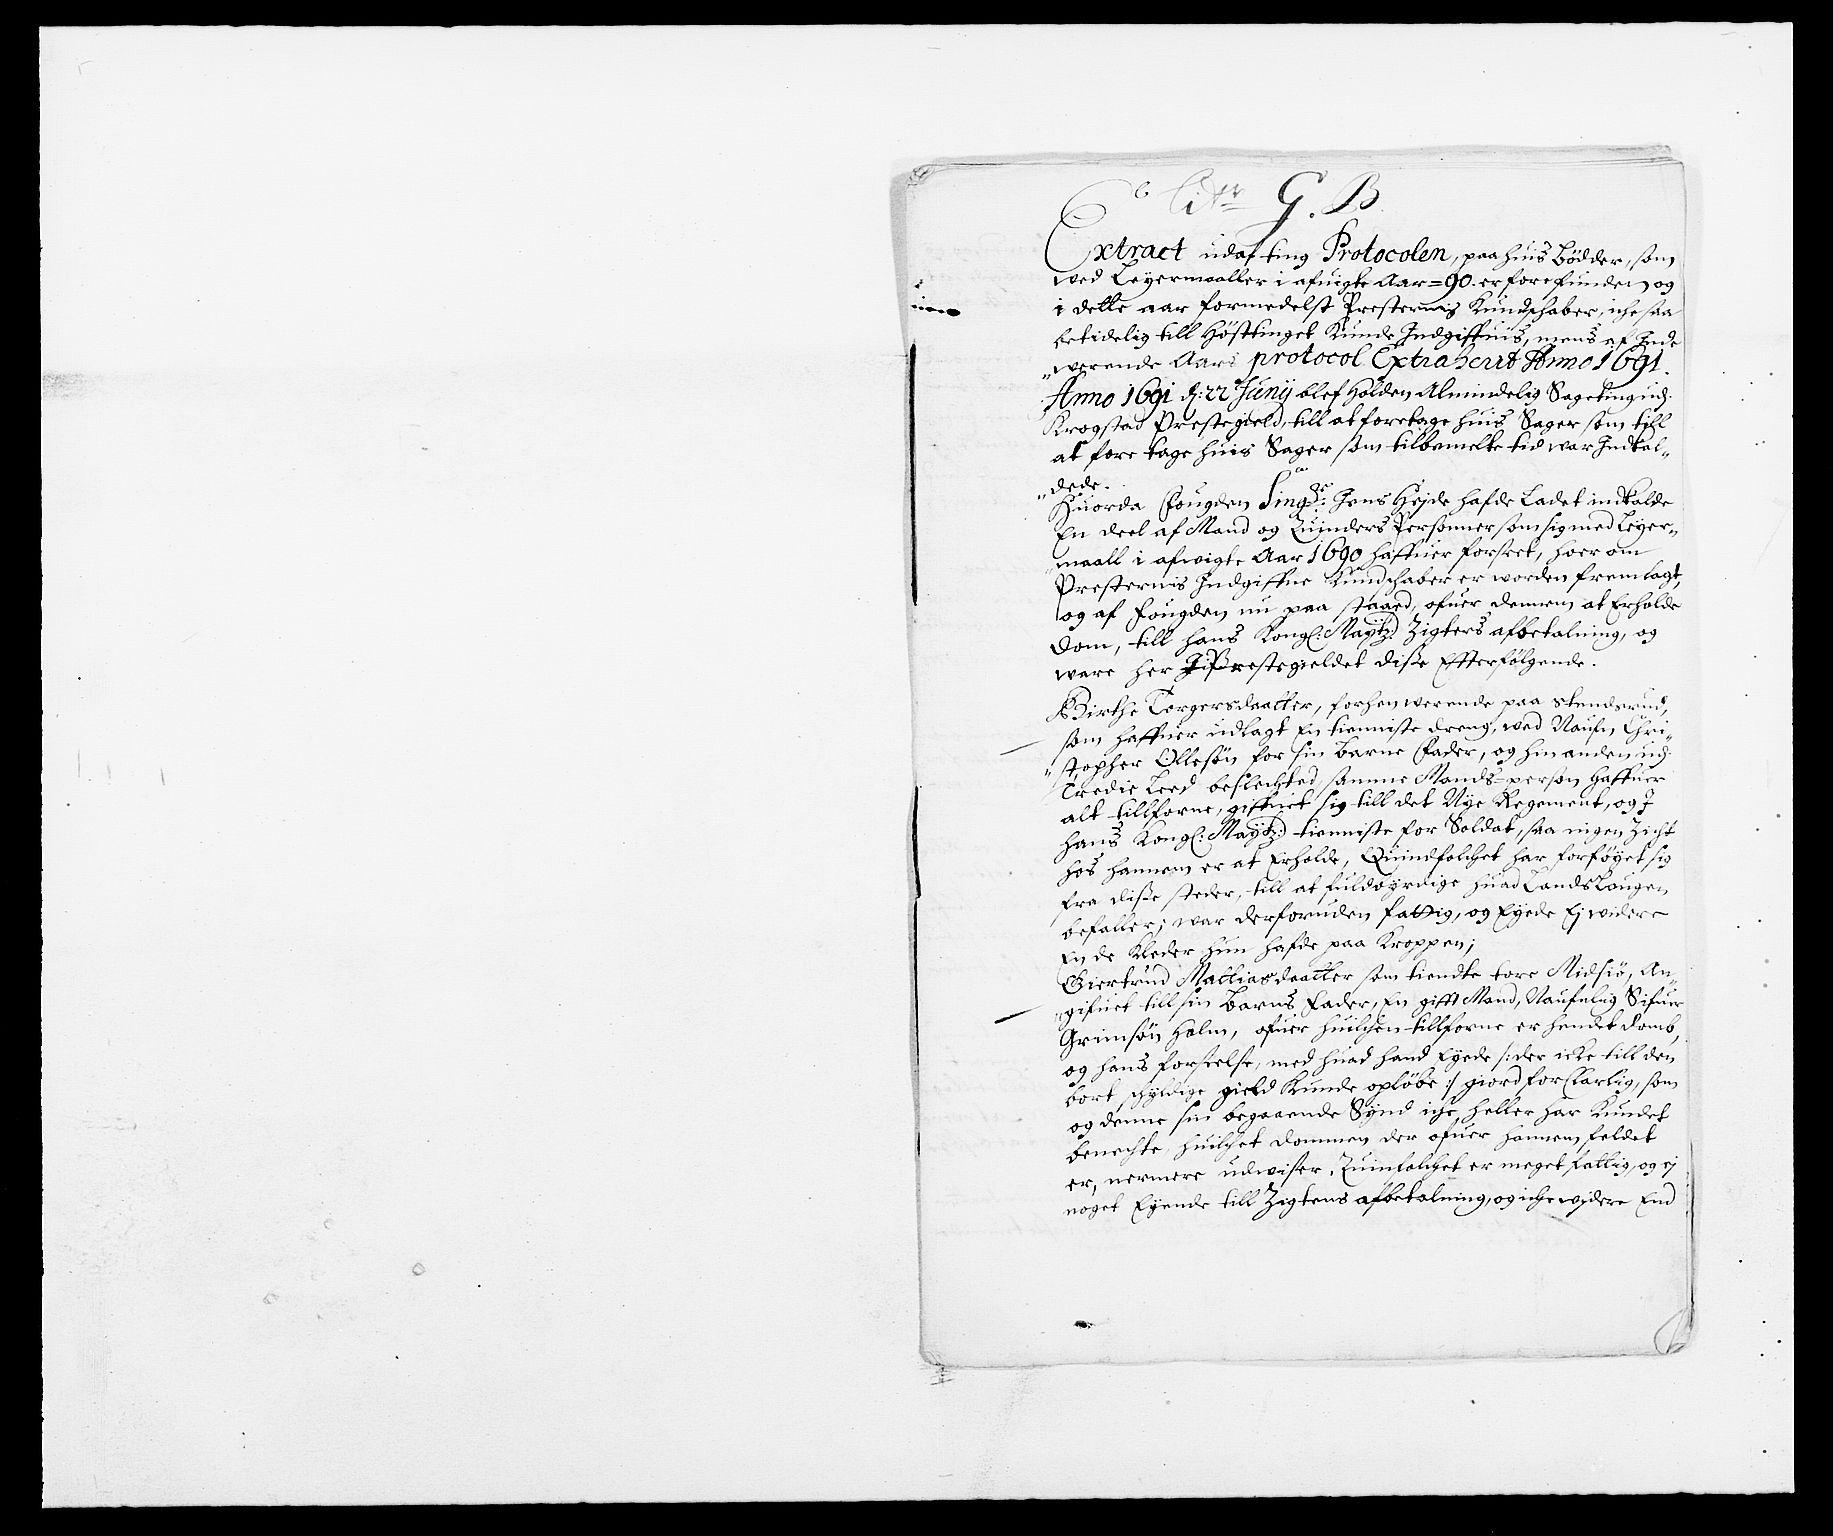 RA, Rentekammeret inntil 1814, Reviderte regnskaper, Fogderegnskap, R09/L0435: Fogderegnskap Follo, 1689-1691, s. 408